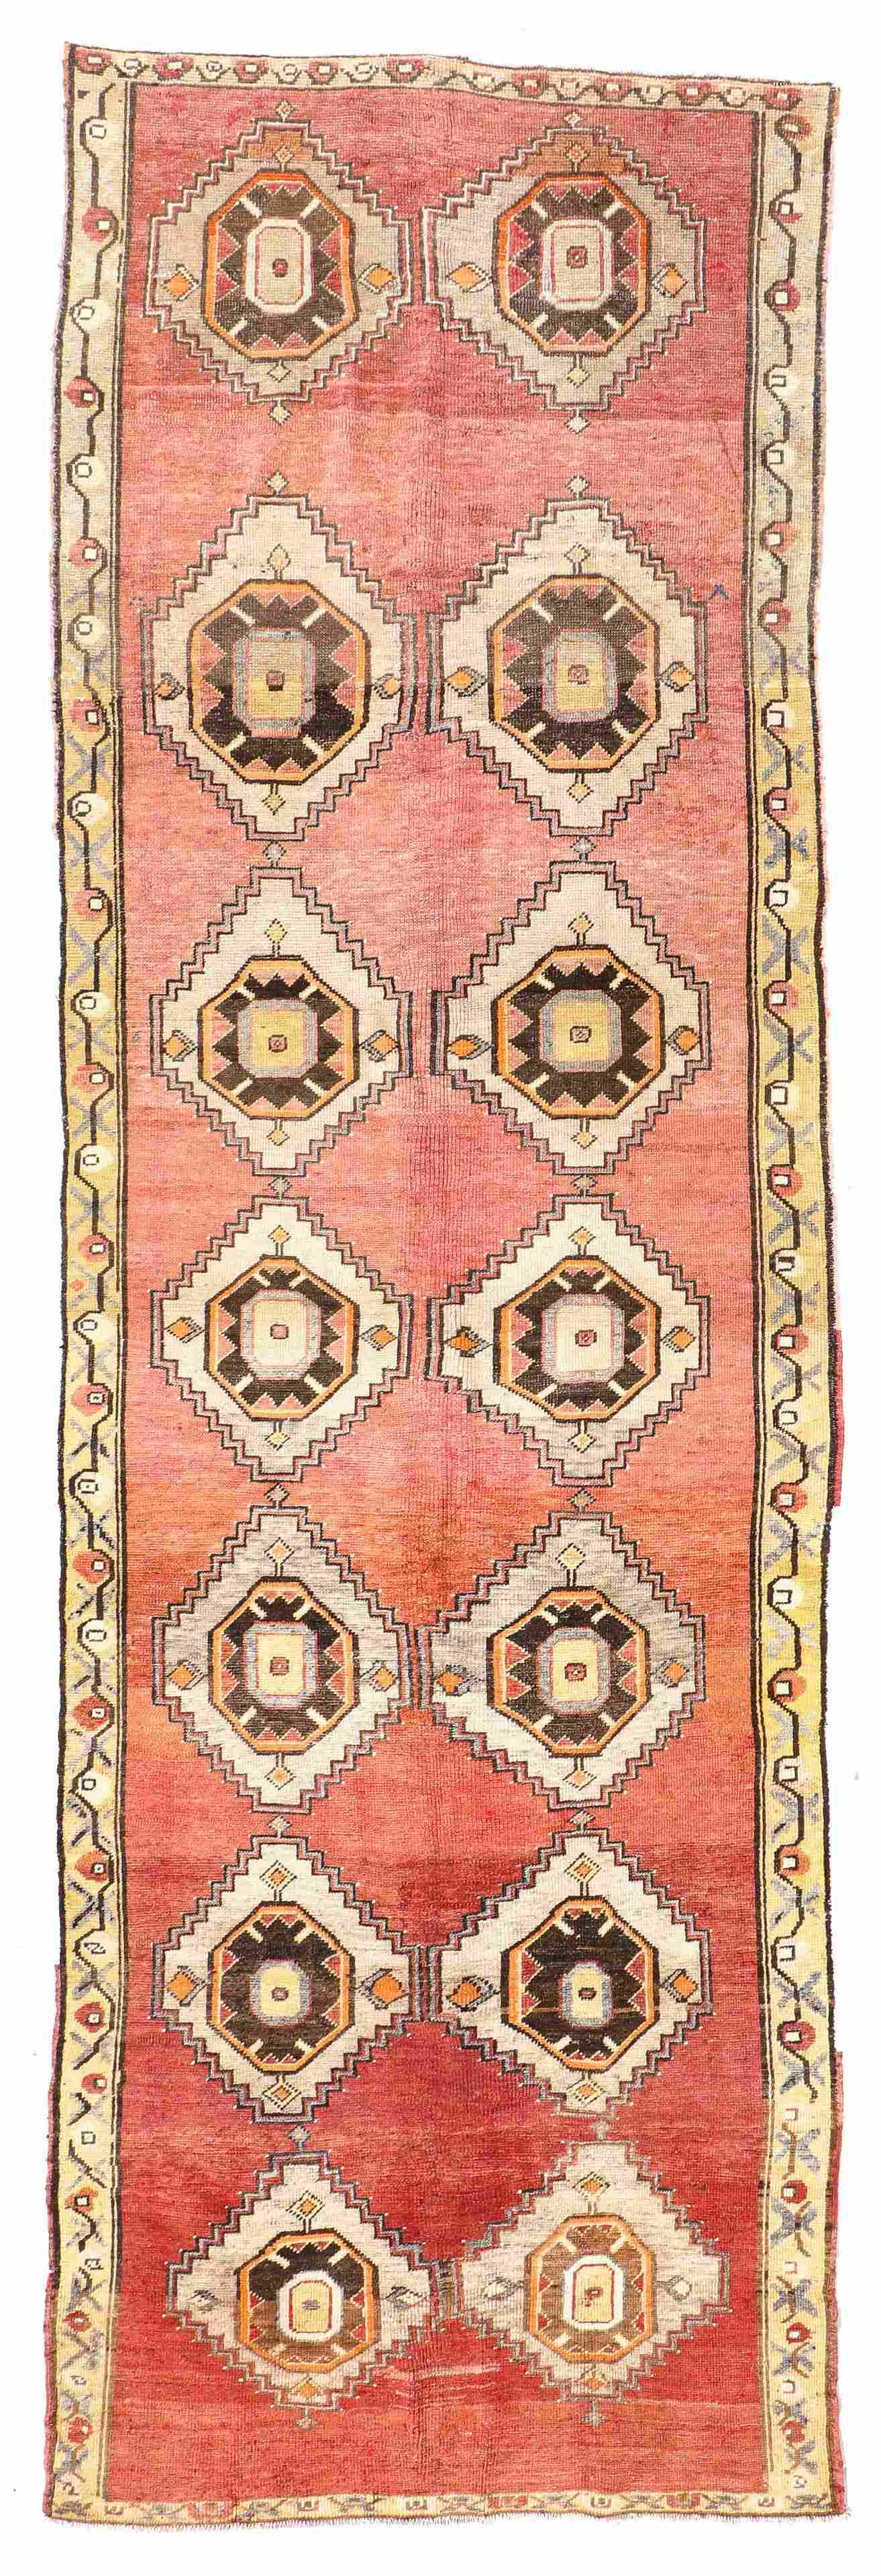 Oushak Village Rug, Turkey, Early 20th C., 3'11'' x